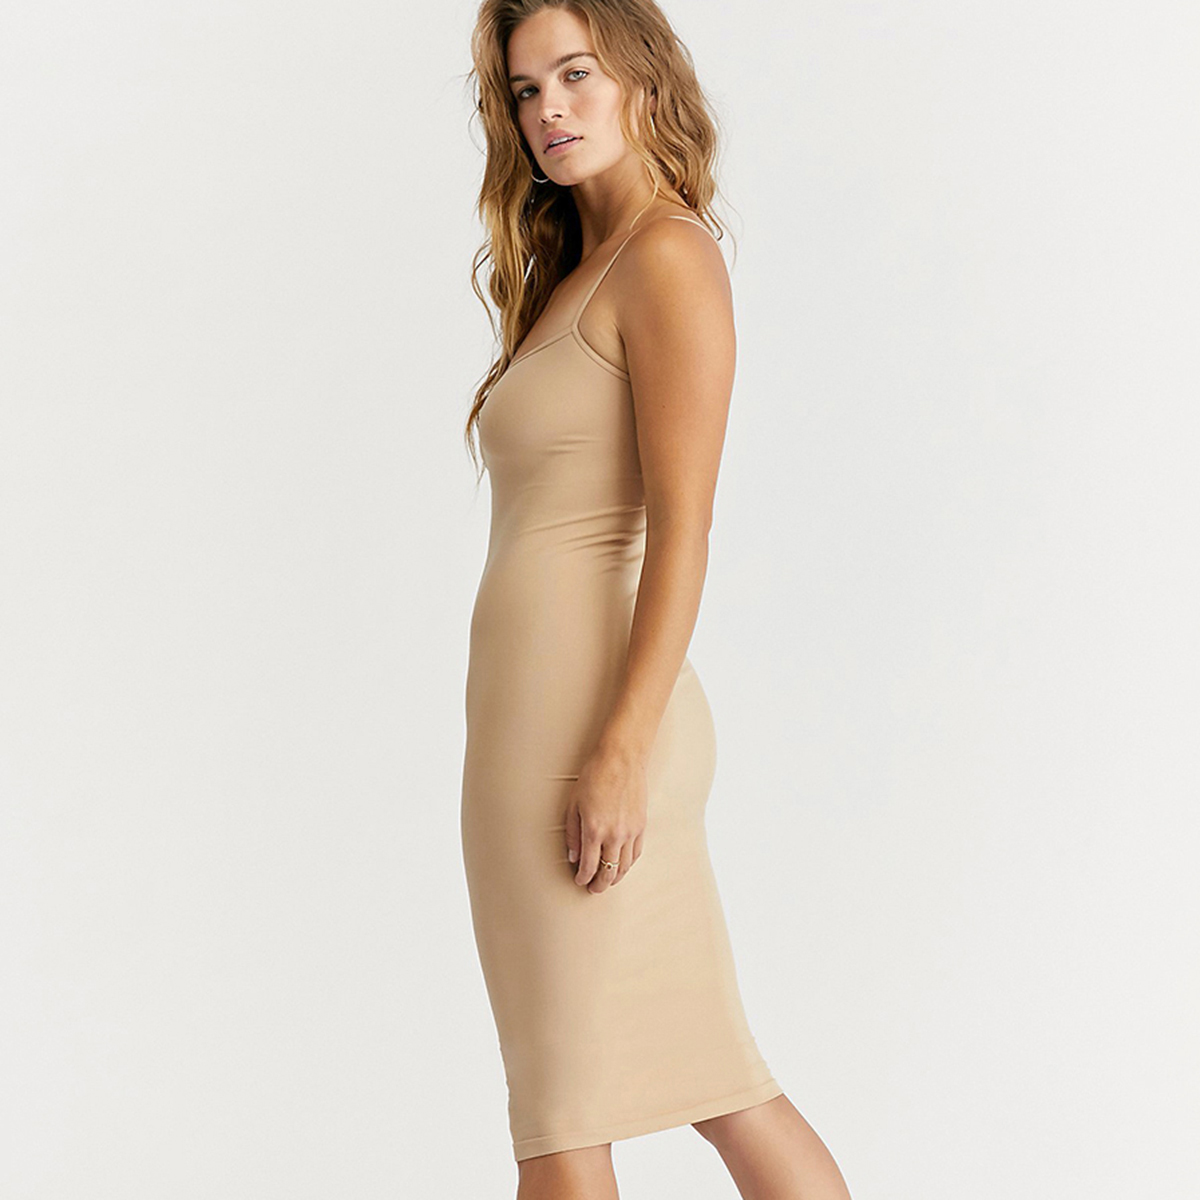 Seamless Nude Slip Dress 2021 Summer Autumn Women Adjustable Strap Sexy Vestidos Stretchy Bodycon Slim Midi Dress Underdress